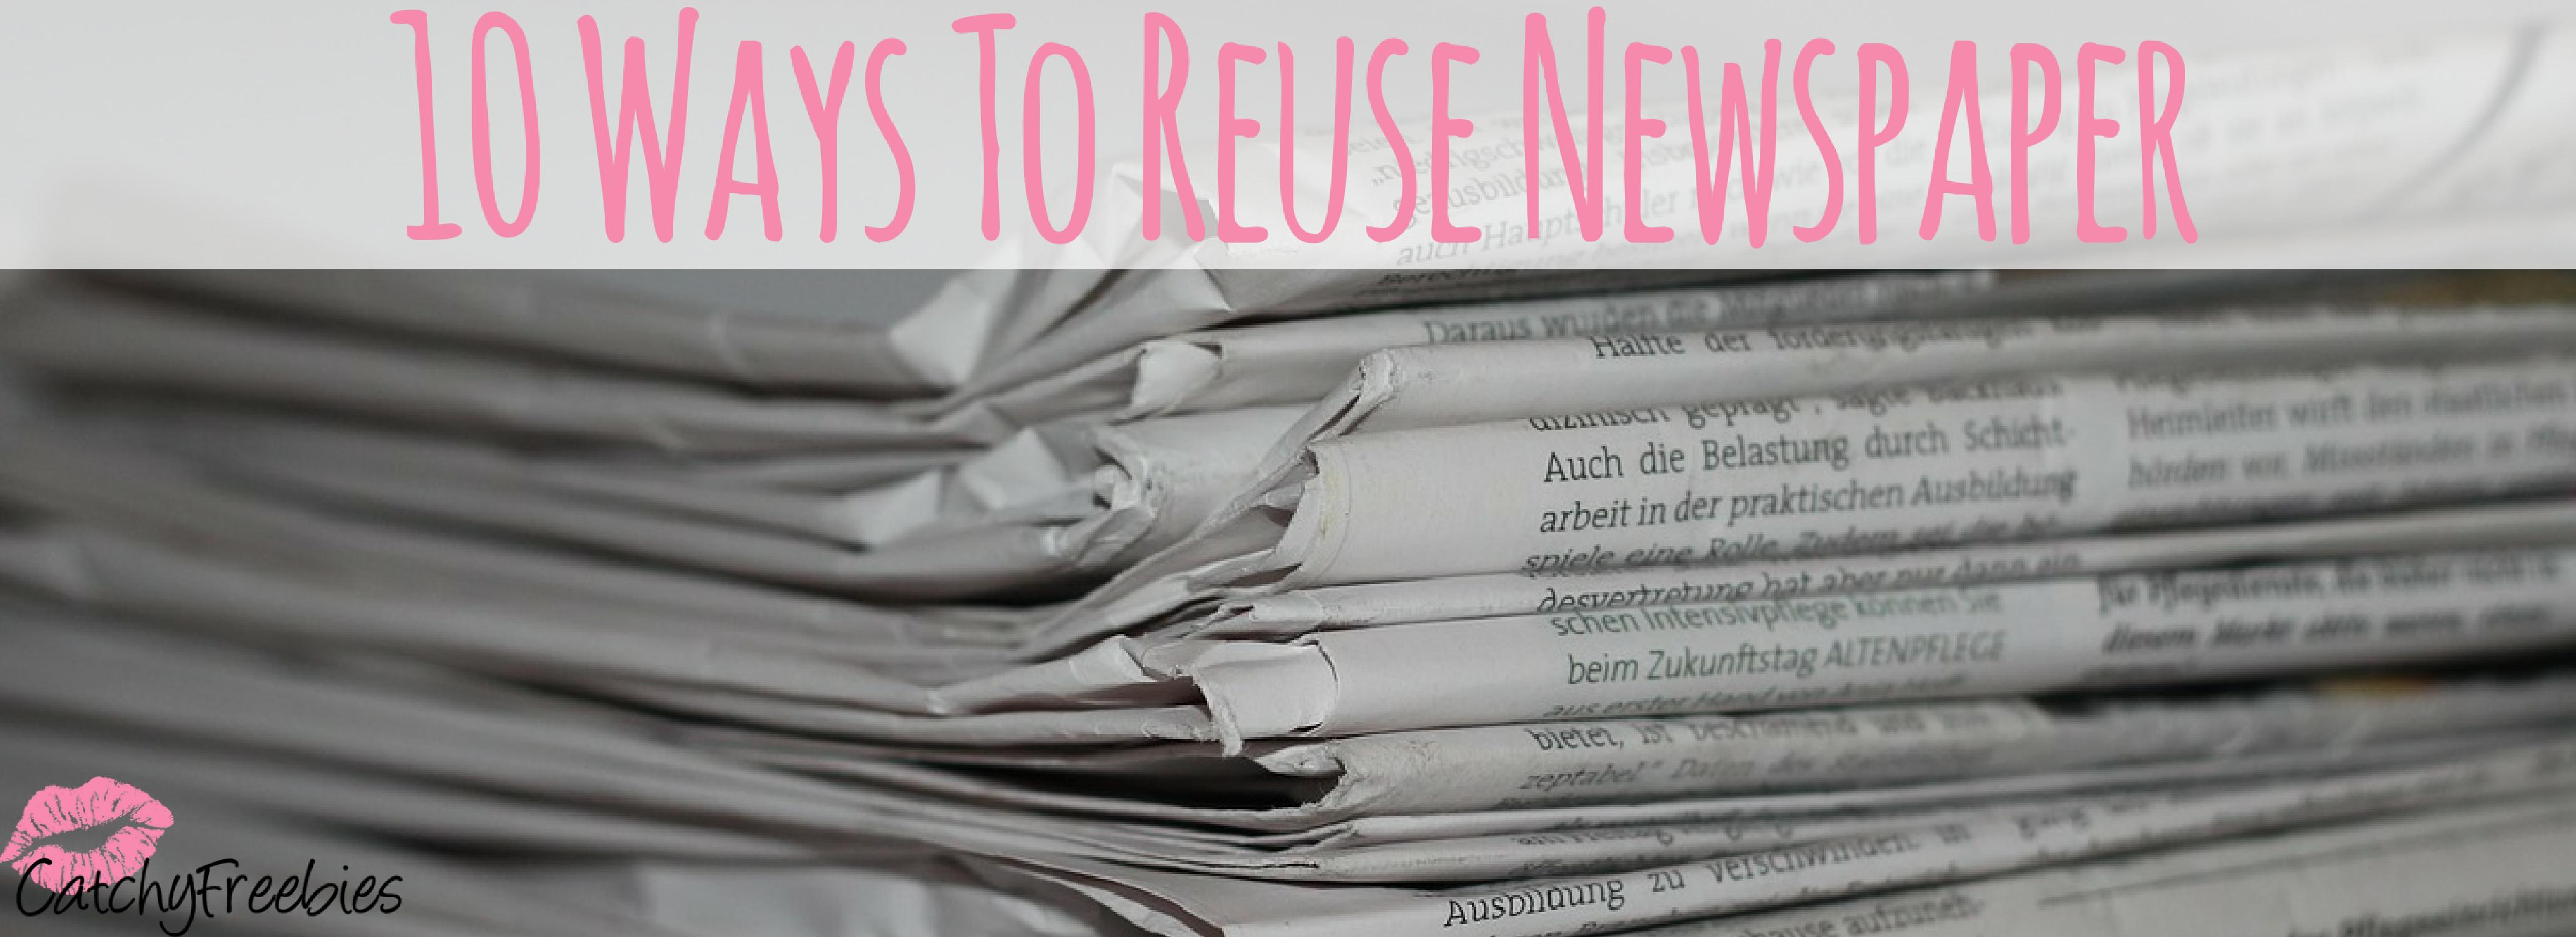 10 Ways To Reuse Newspaper